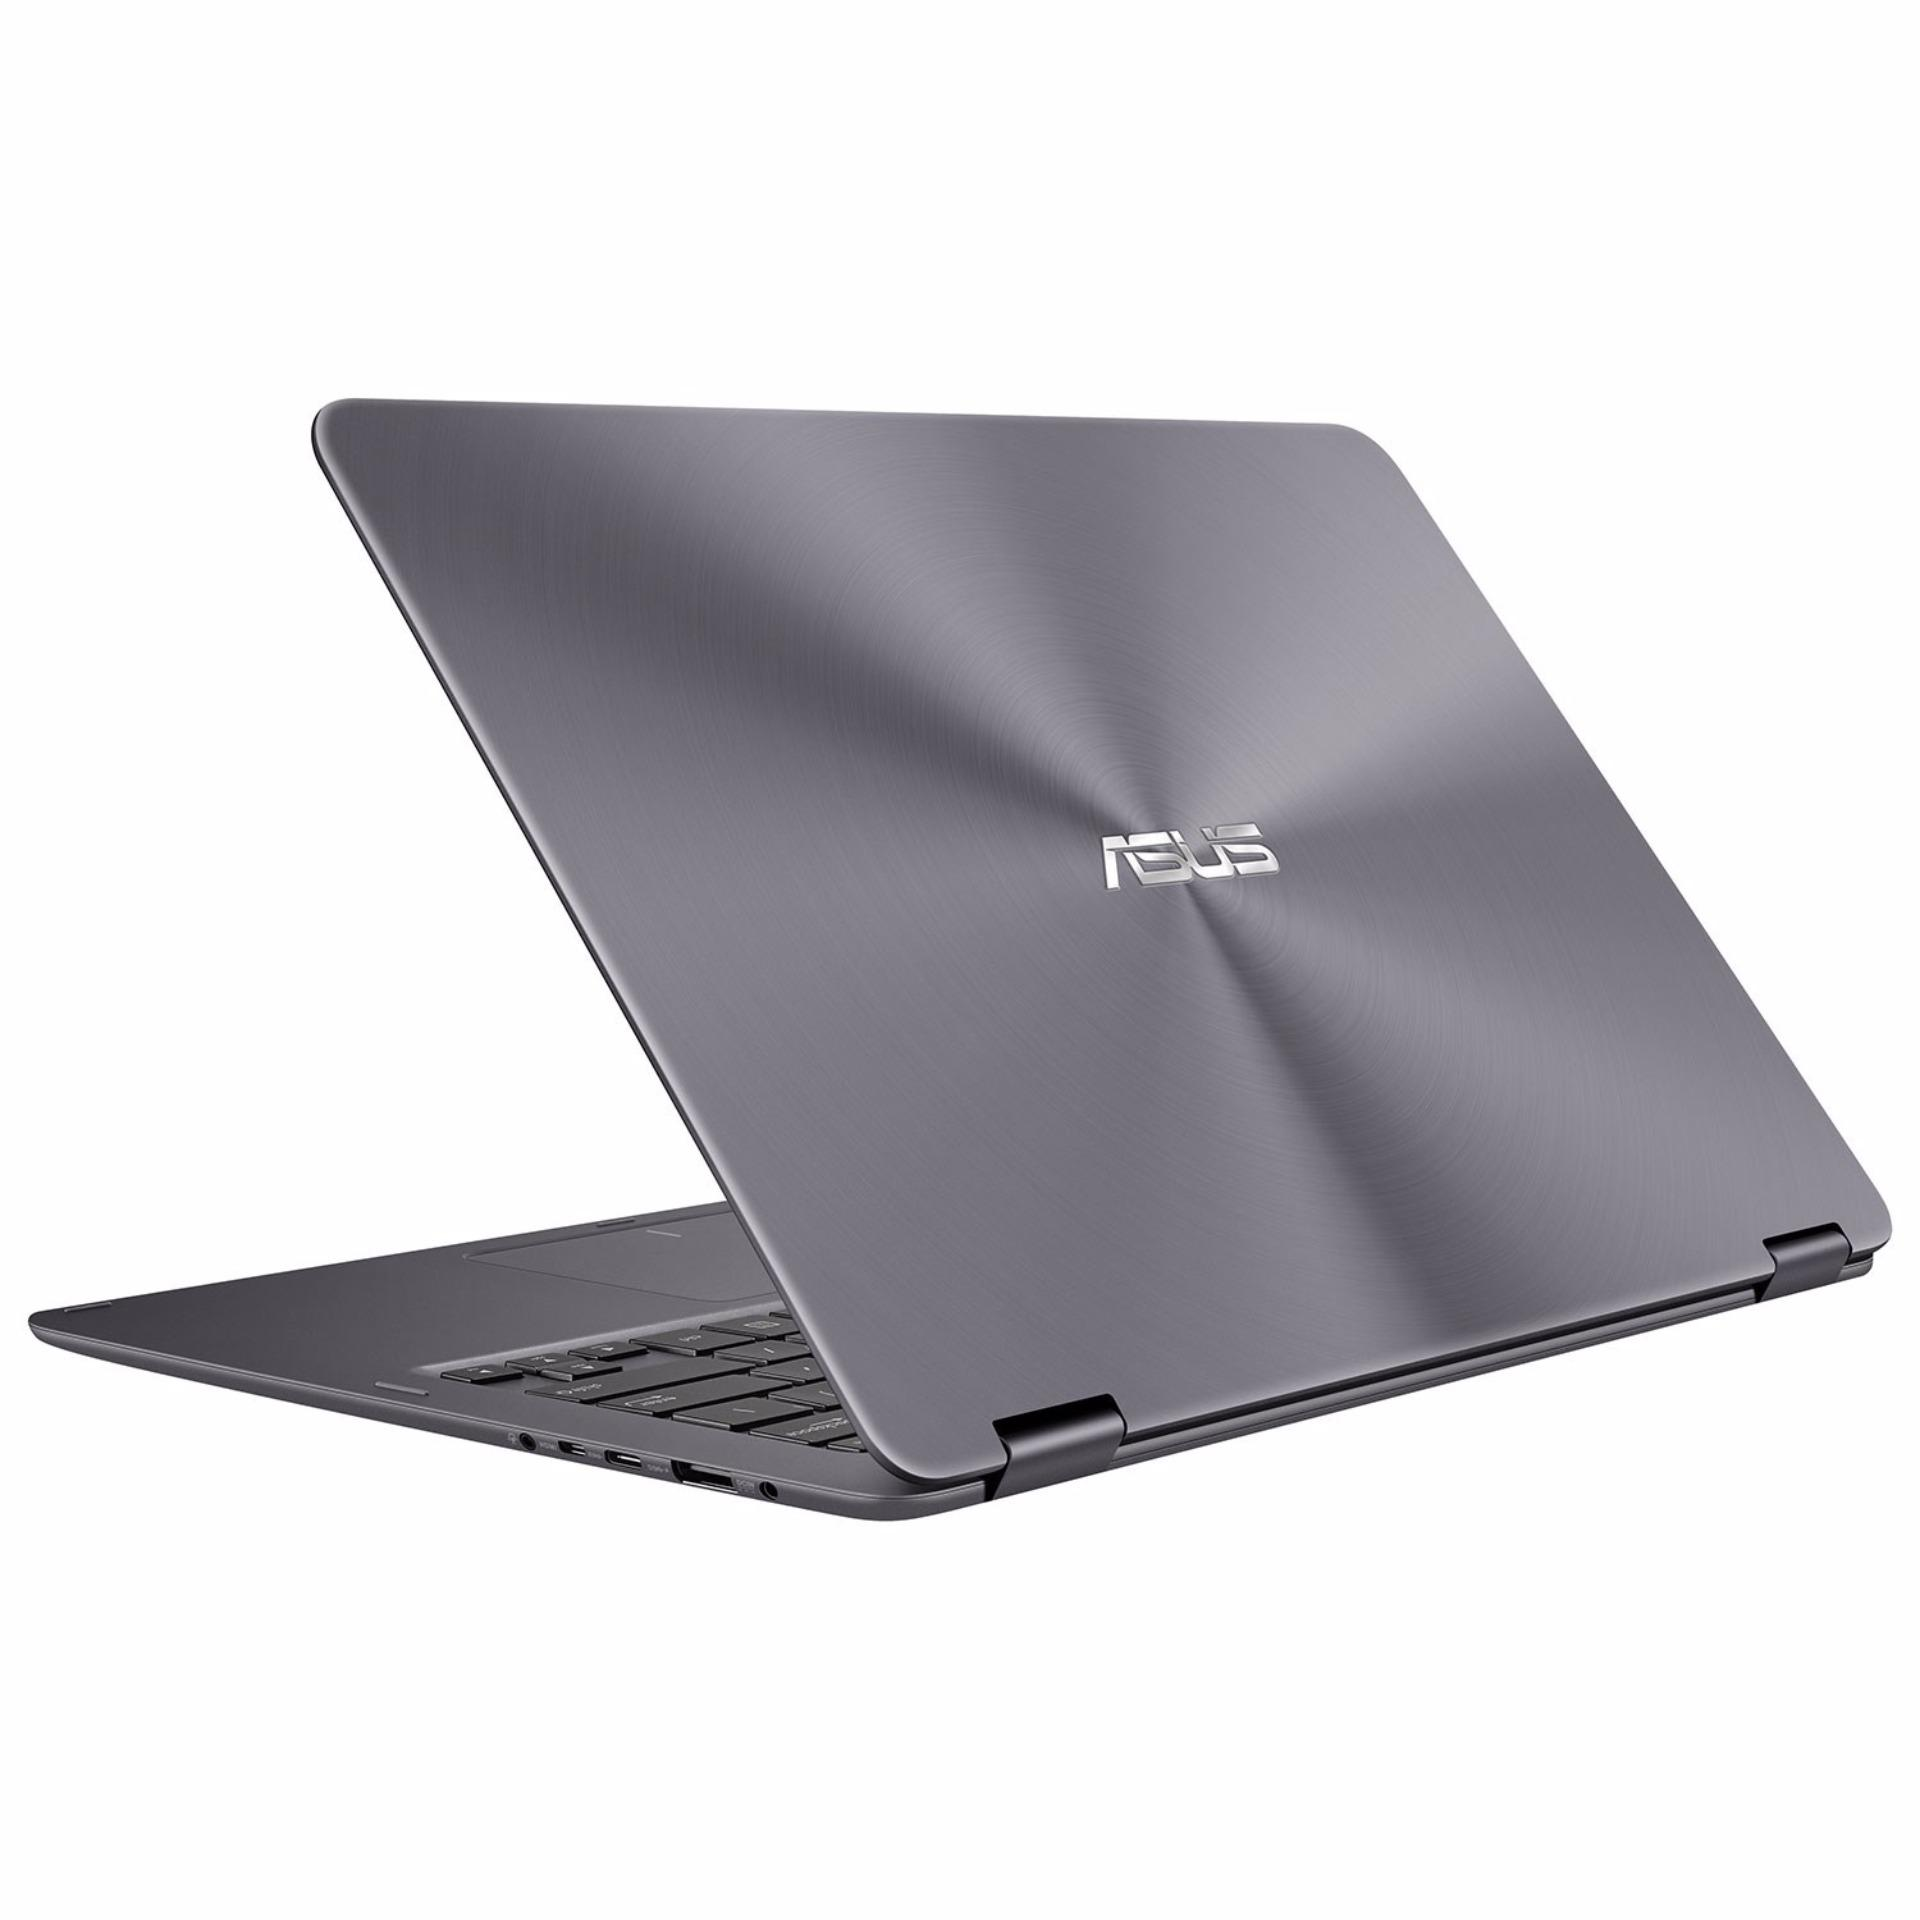 Hp 14 Bs006tu Intel Celeron N3060 Ram 4gb 500gb Windows 10 Gold Am517tu Black Operating System Asus Zenbook Flip Ux360ca Ubm1t Notebook Grey M3